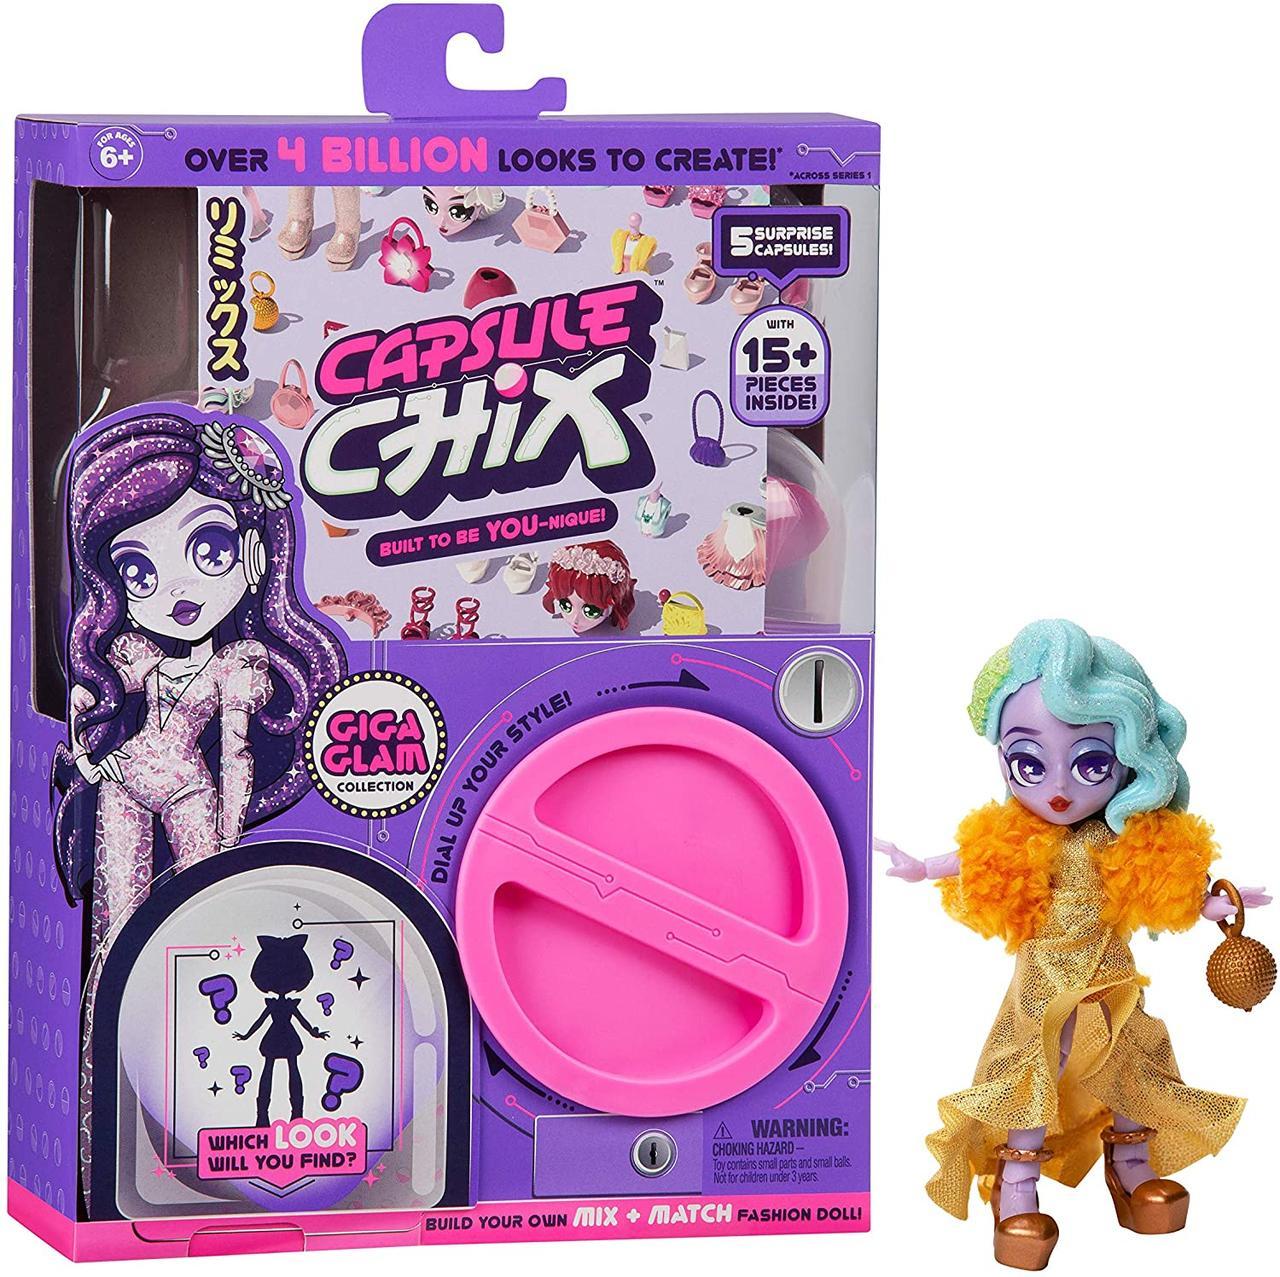 Кукла-сюрприз Капсул Чикс Гига Глэм Capsule Chix Giga Glam